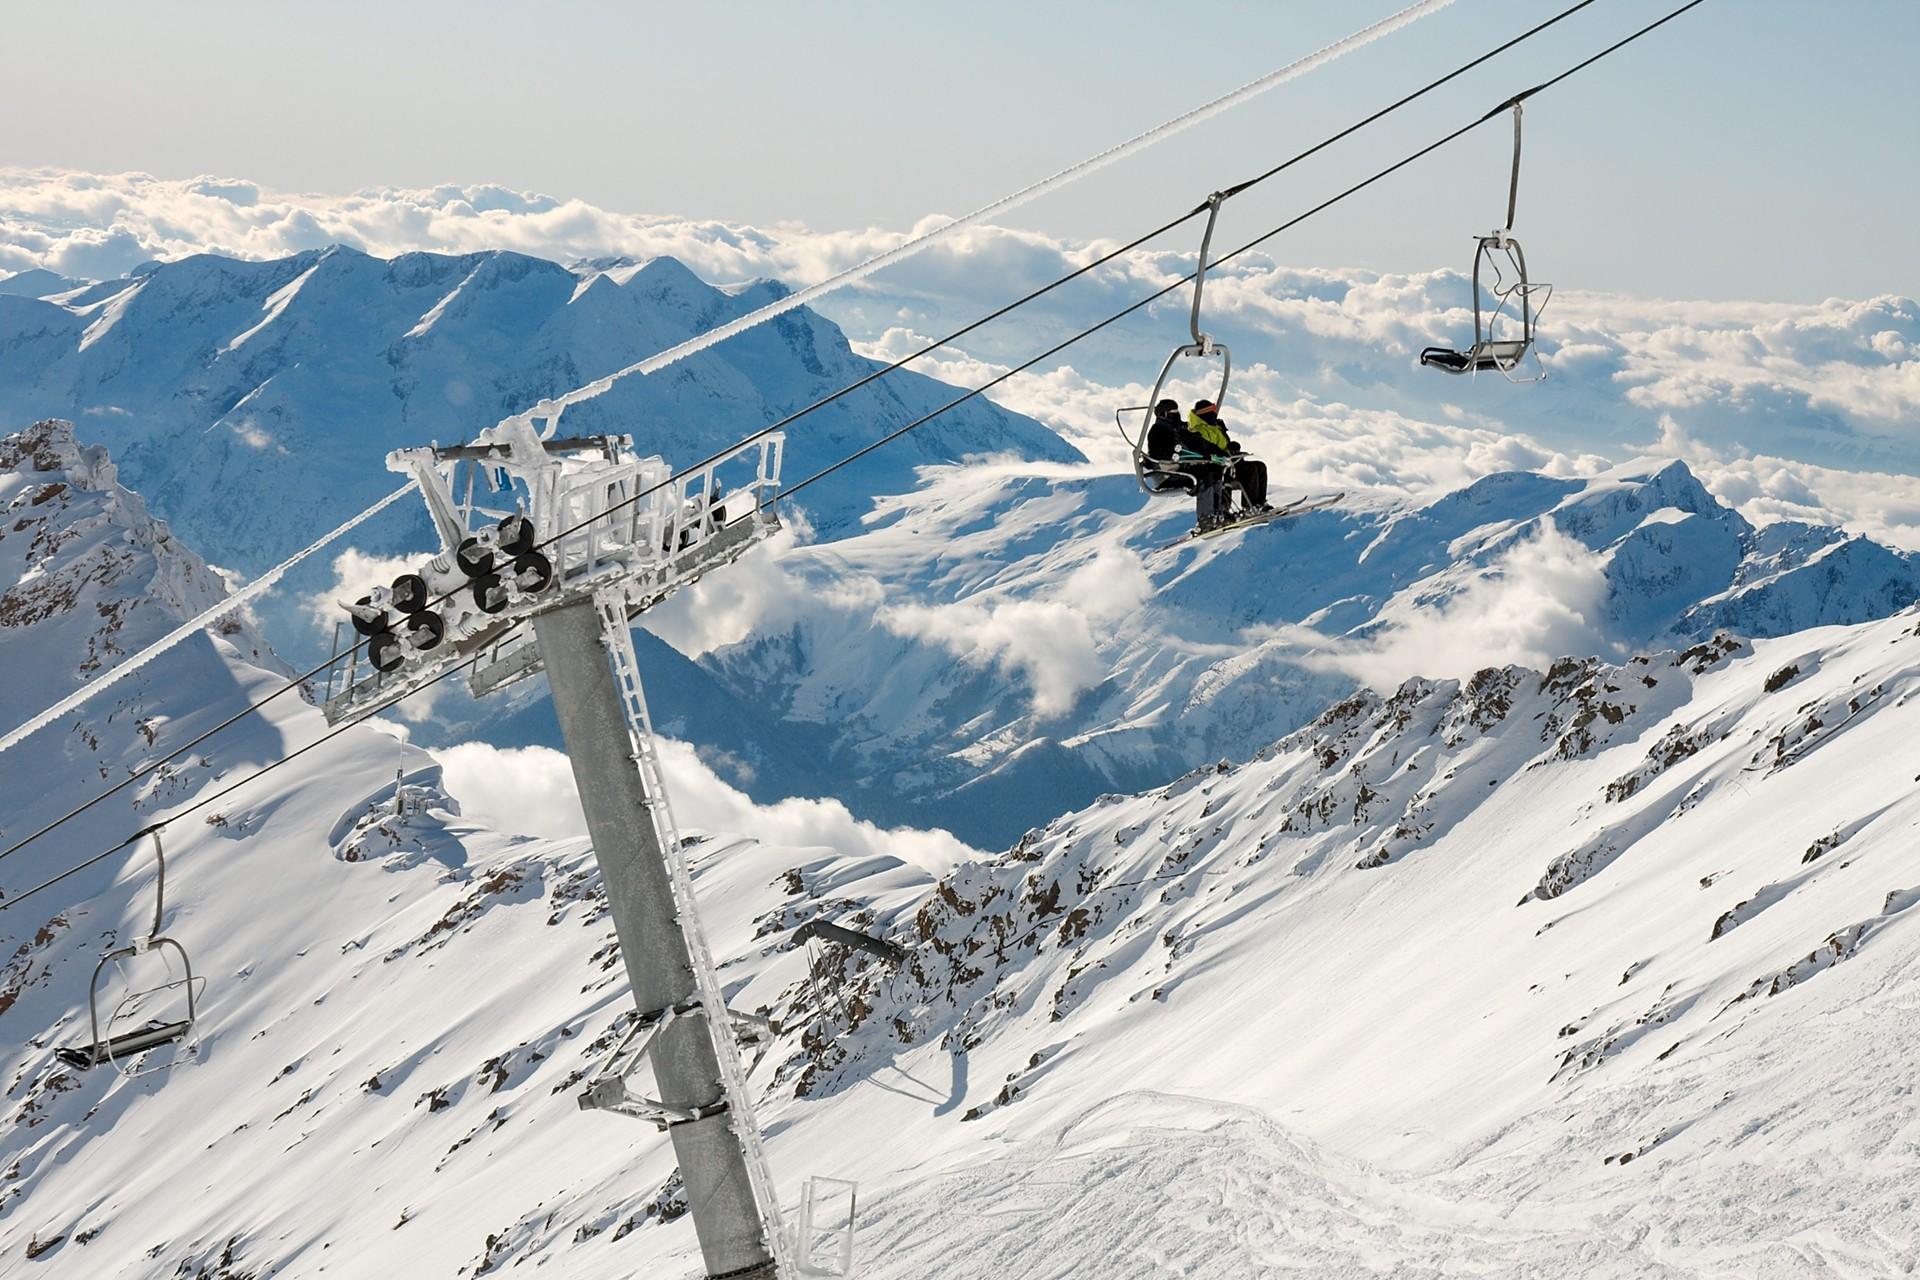 Skigebied l'Alpe d'Huez